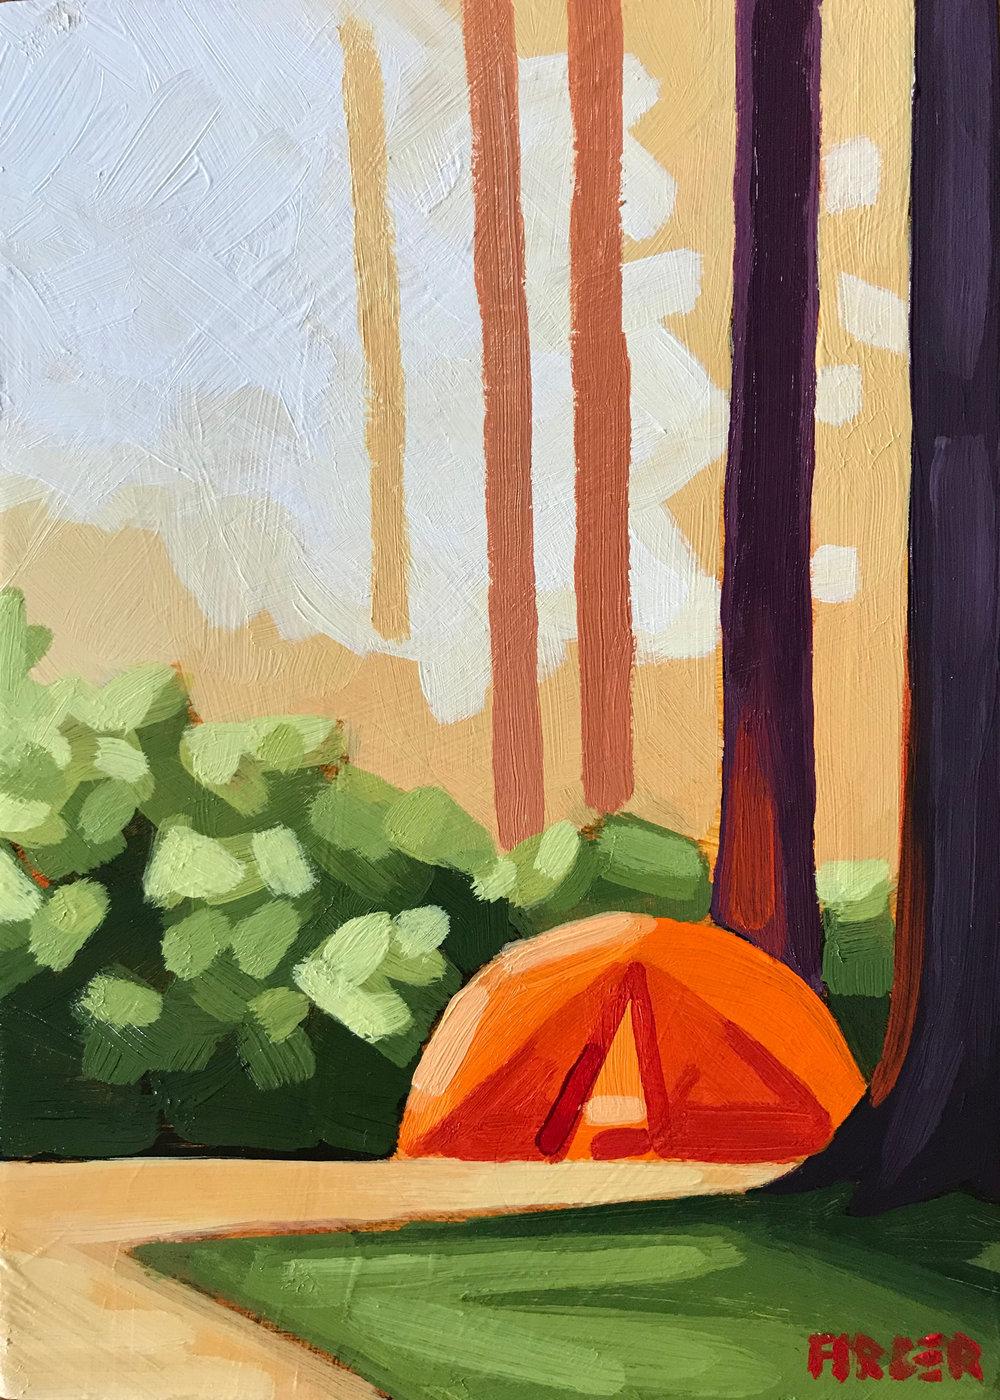 Campsite Sunrise - 5 x 7, Acrylic on Panel